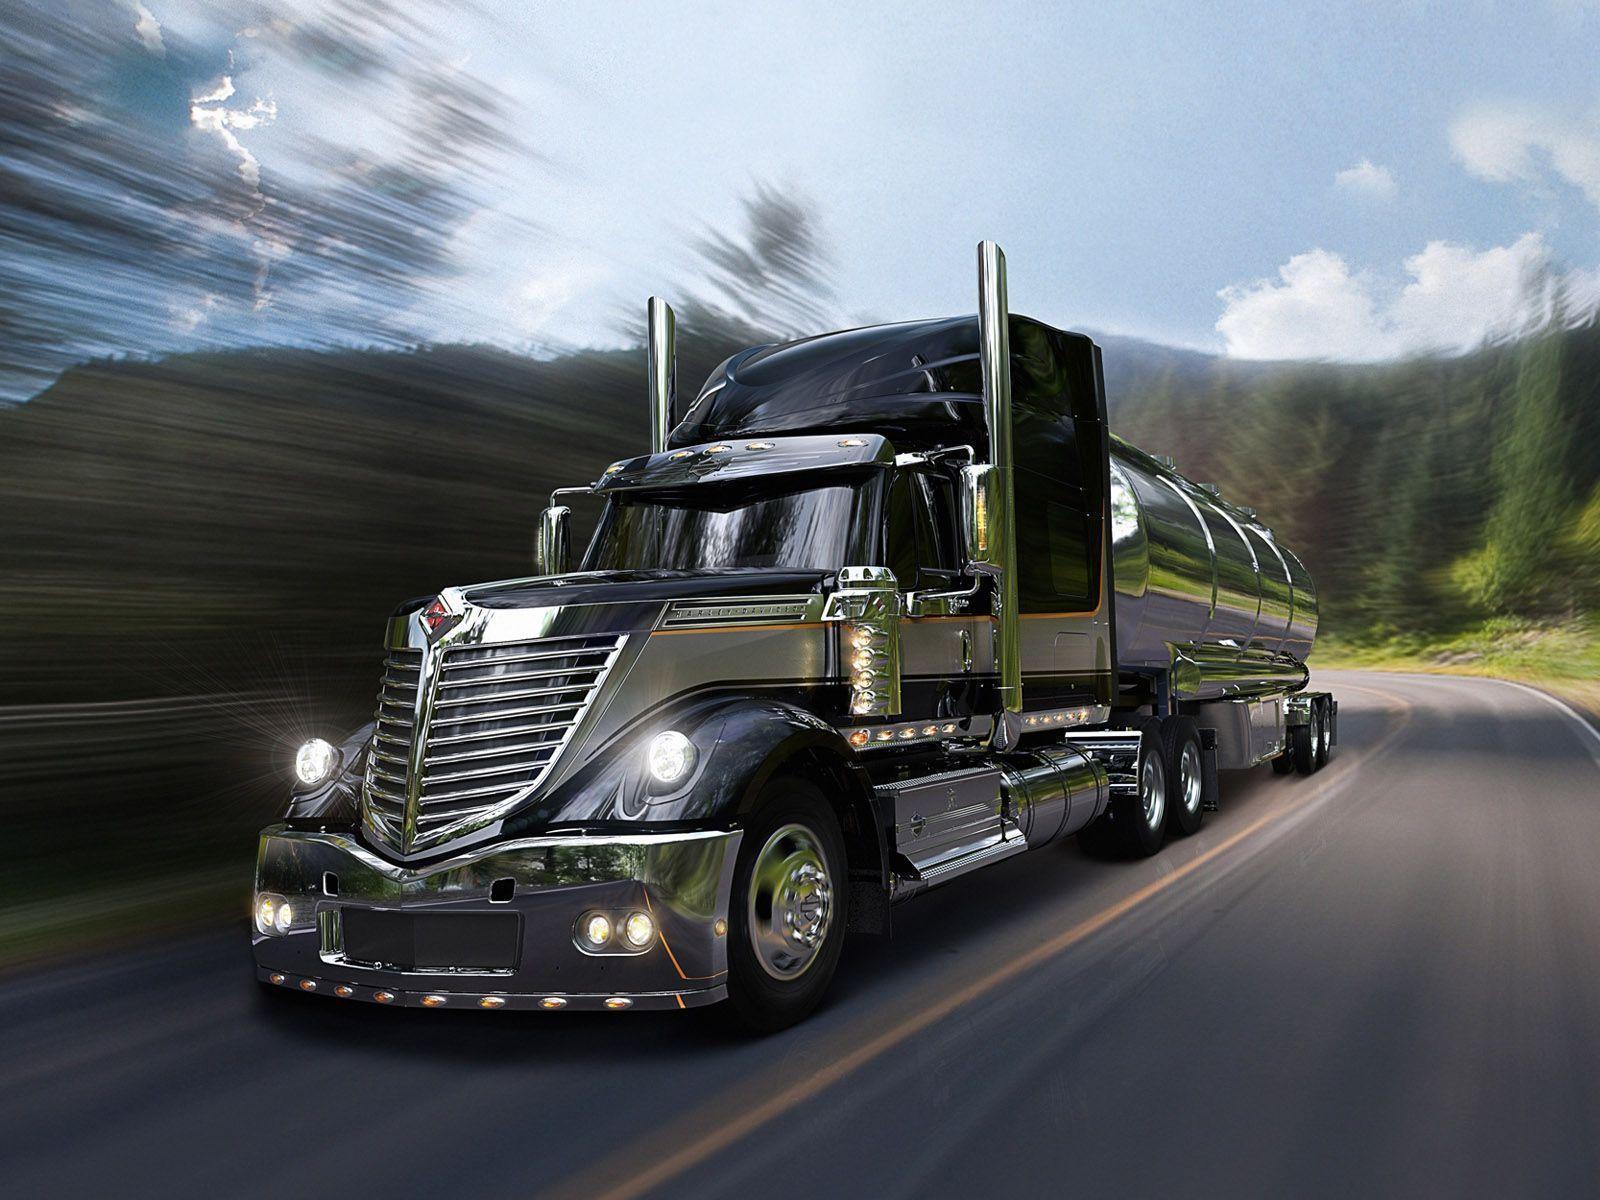 Big Truck Desktop Wallpaper